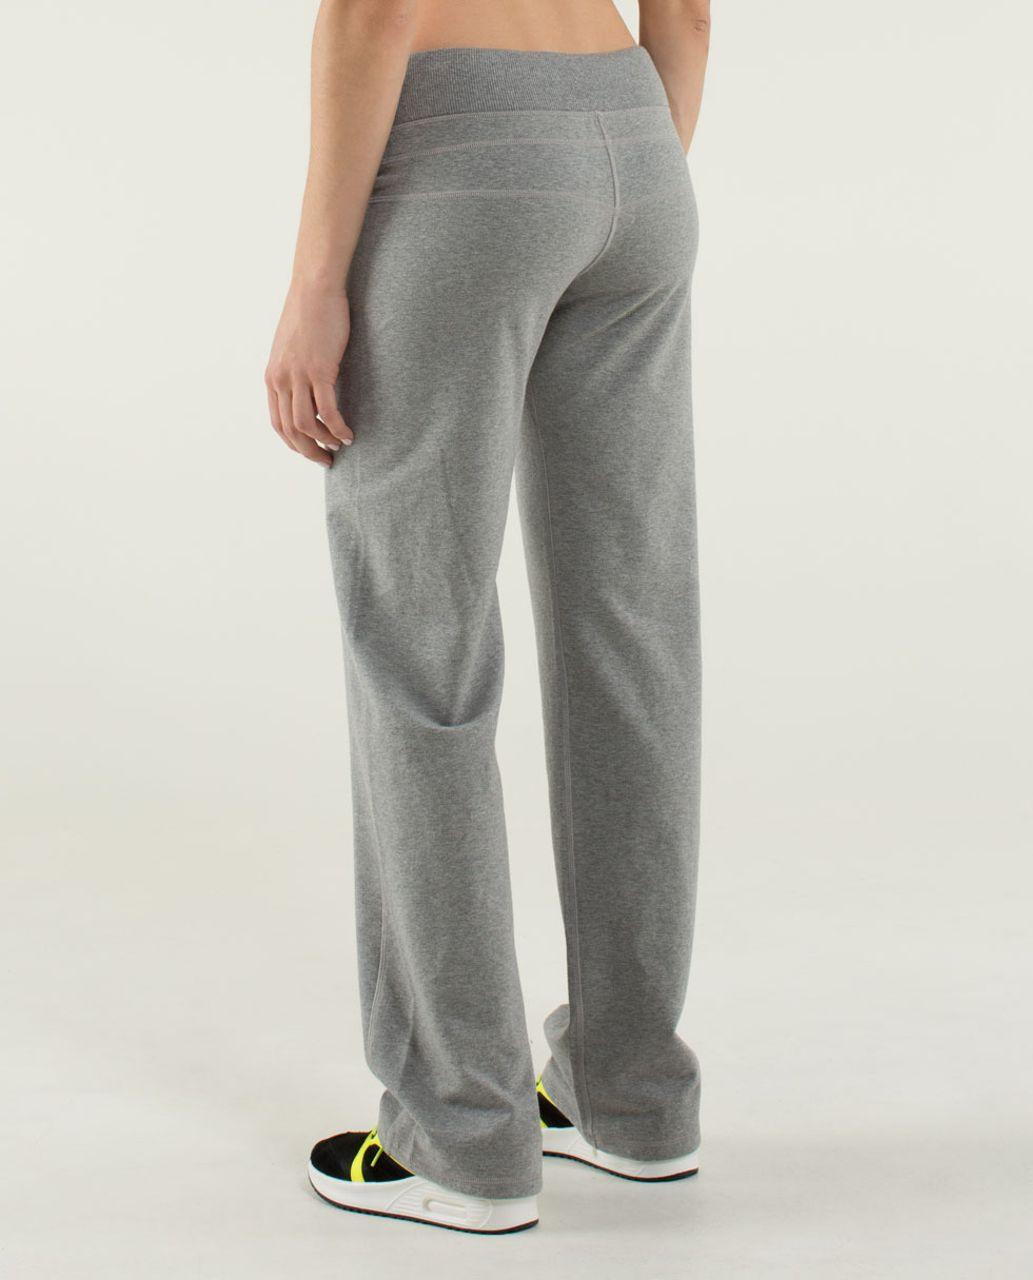 4fd667d271 Lululemon Calm & Cozy Pant - Heathered Medium Grey - lulu fanatics